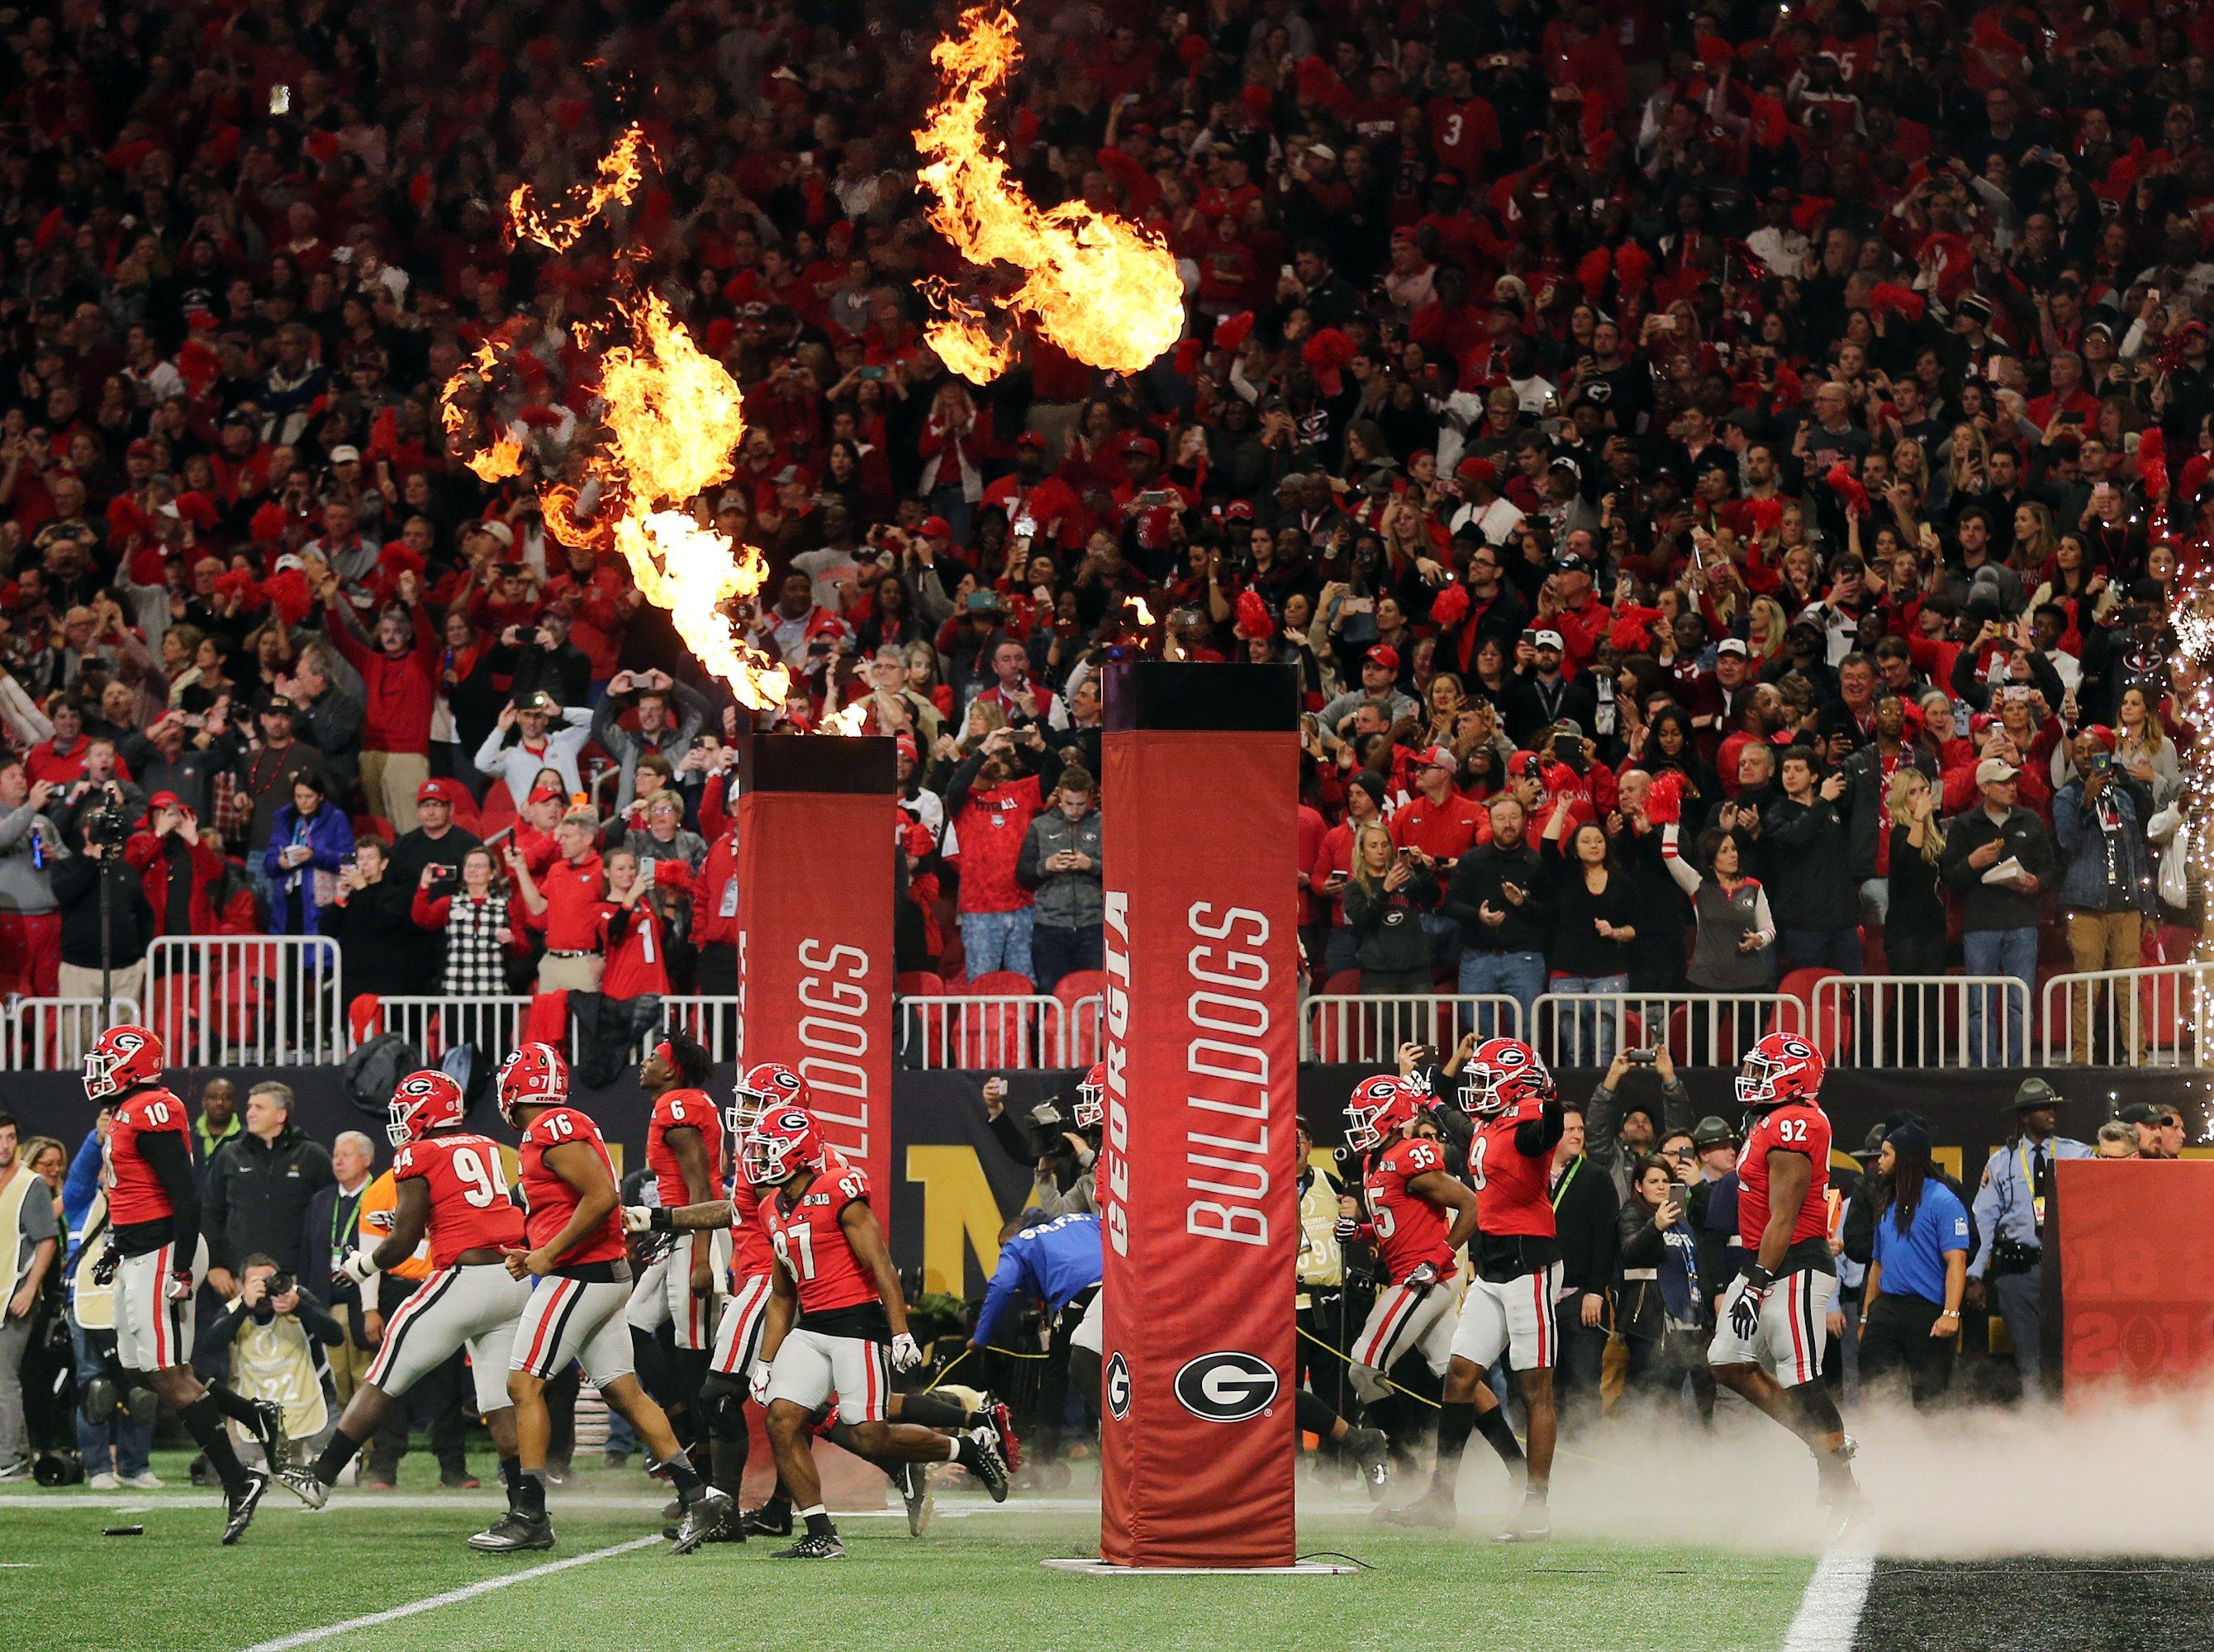 Georgia Bulldogs make their entrance